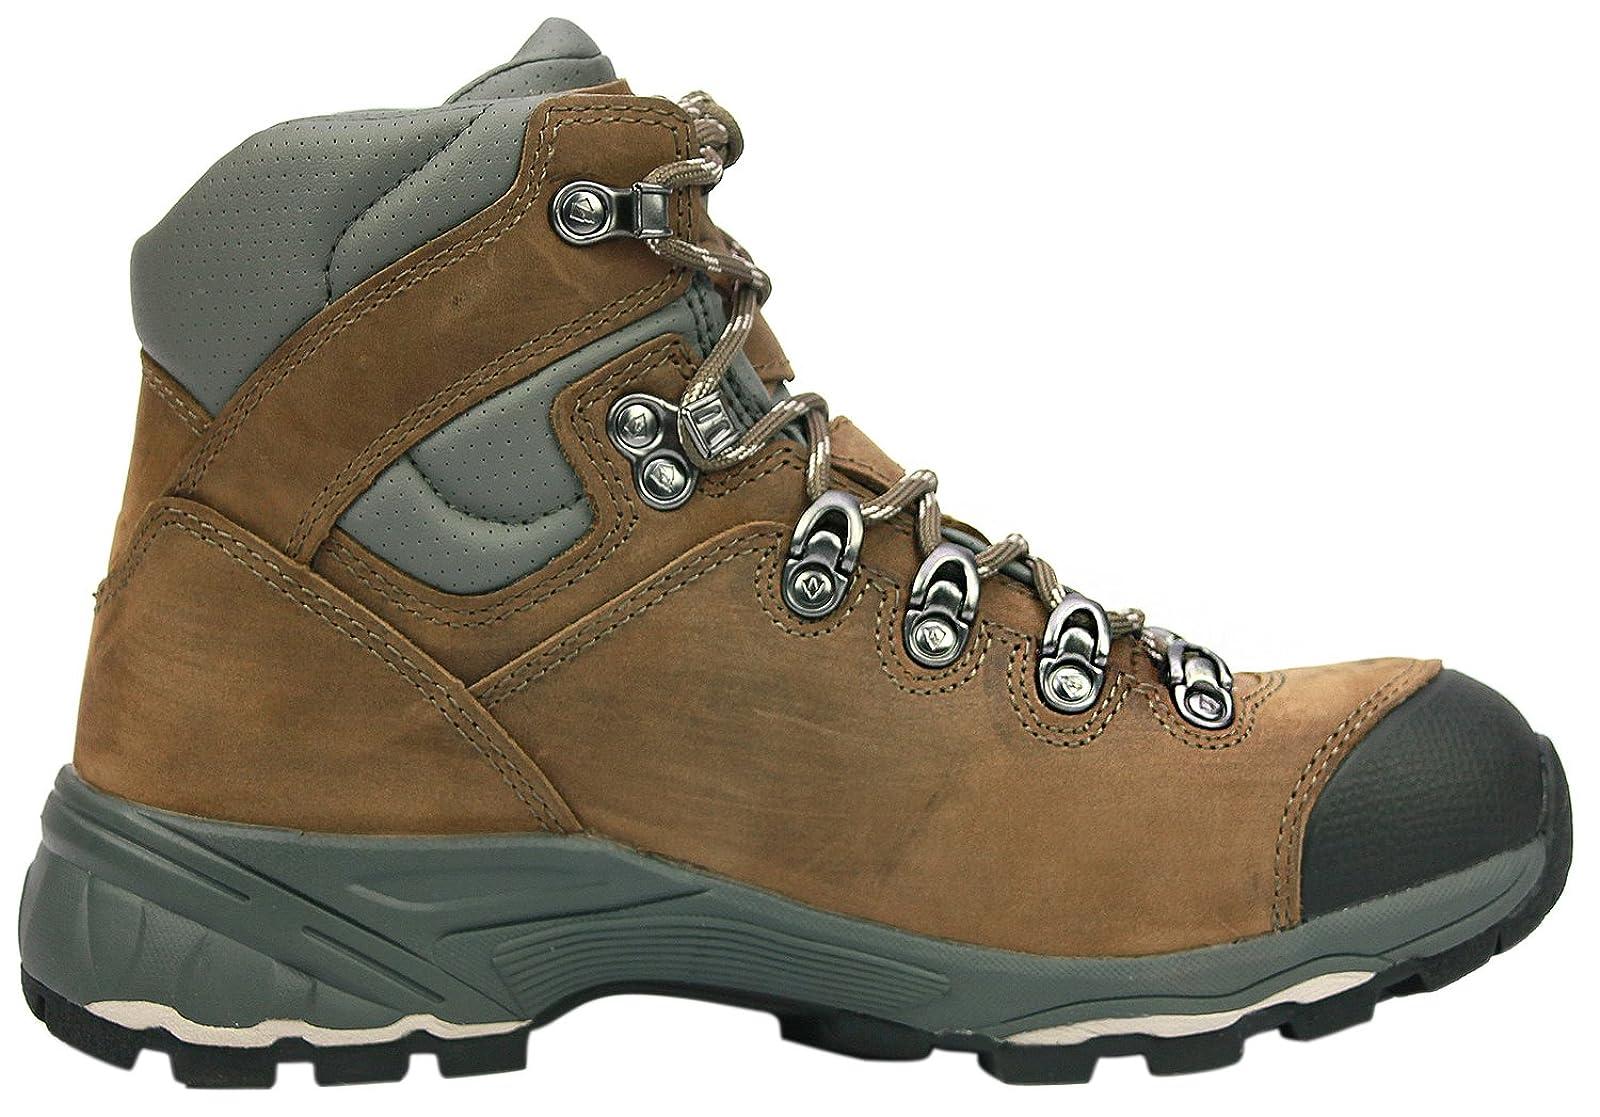 Vasque Women's St. Elias Gore-Tex Hiking Boot 8 M US Women - 9